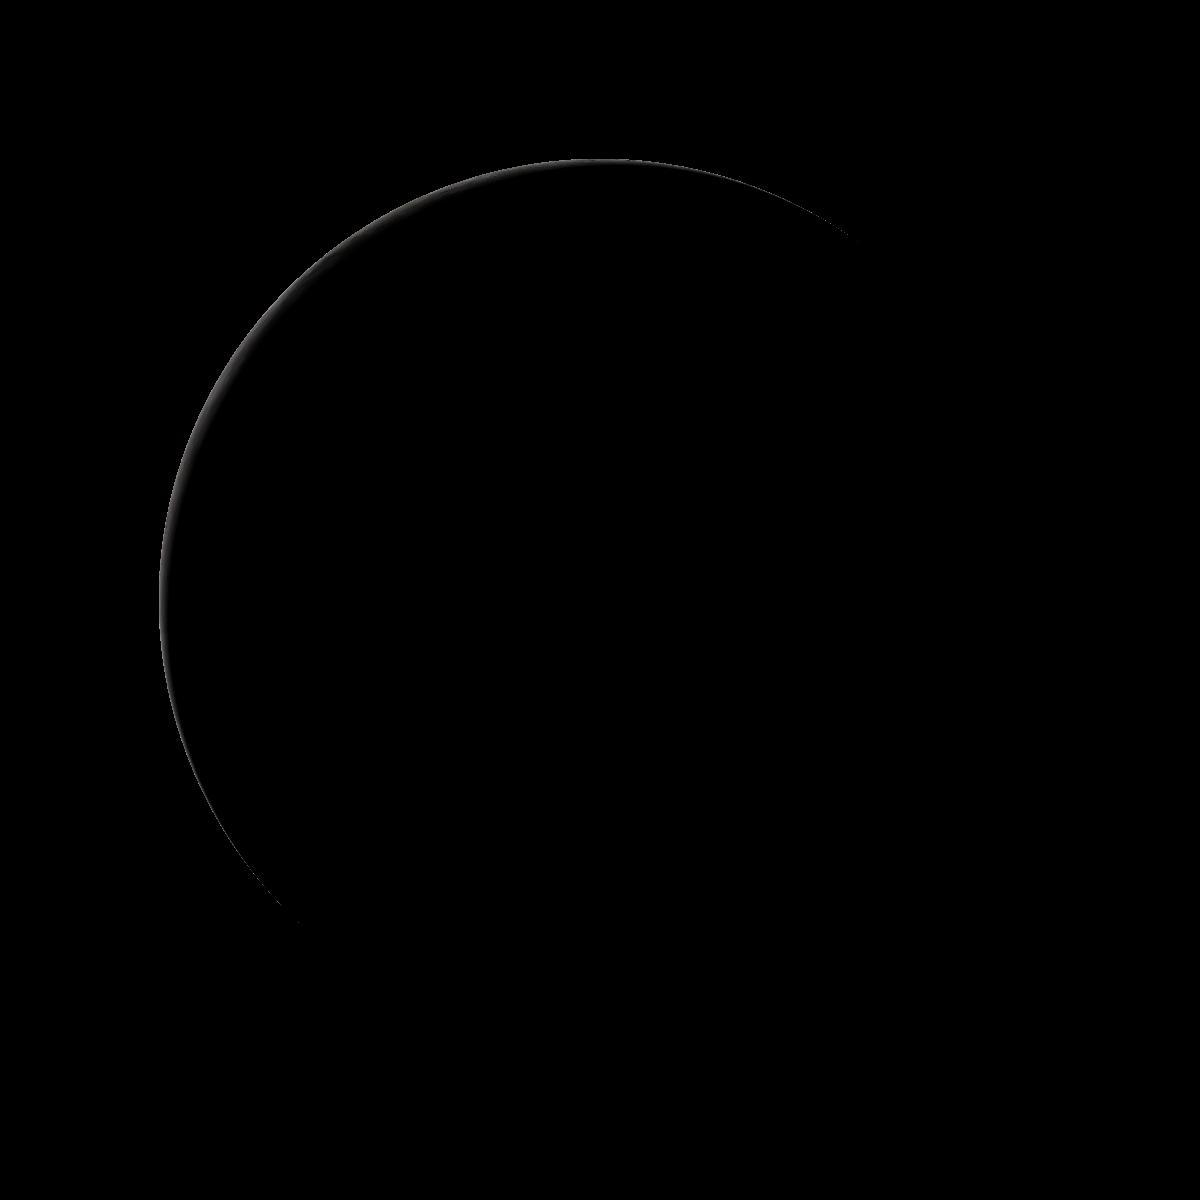 Lune du 23 mars 2020